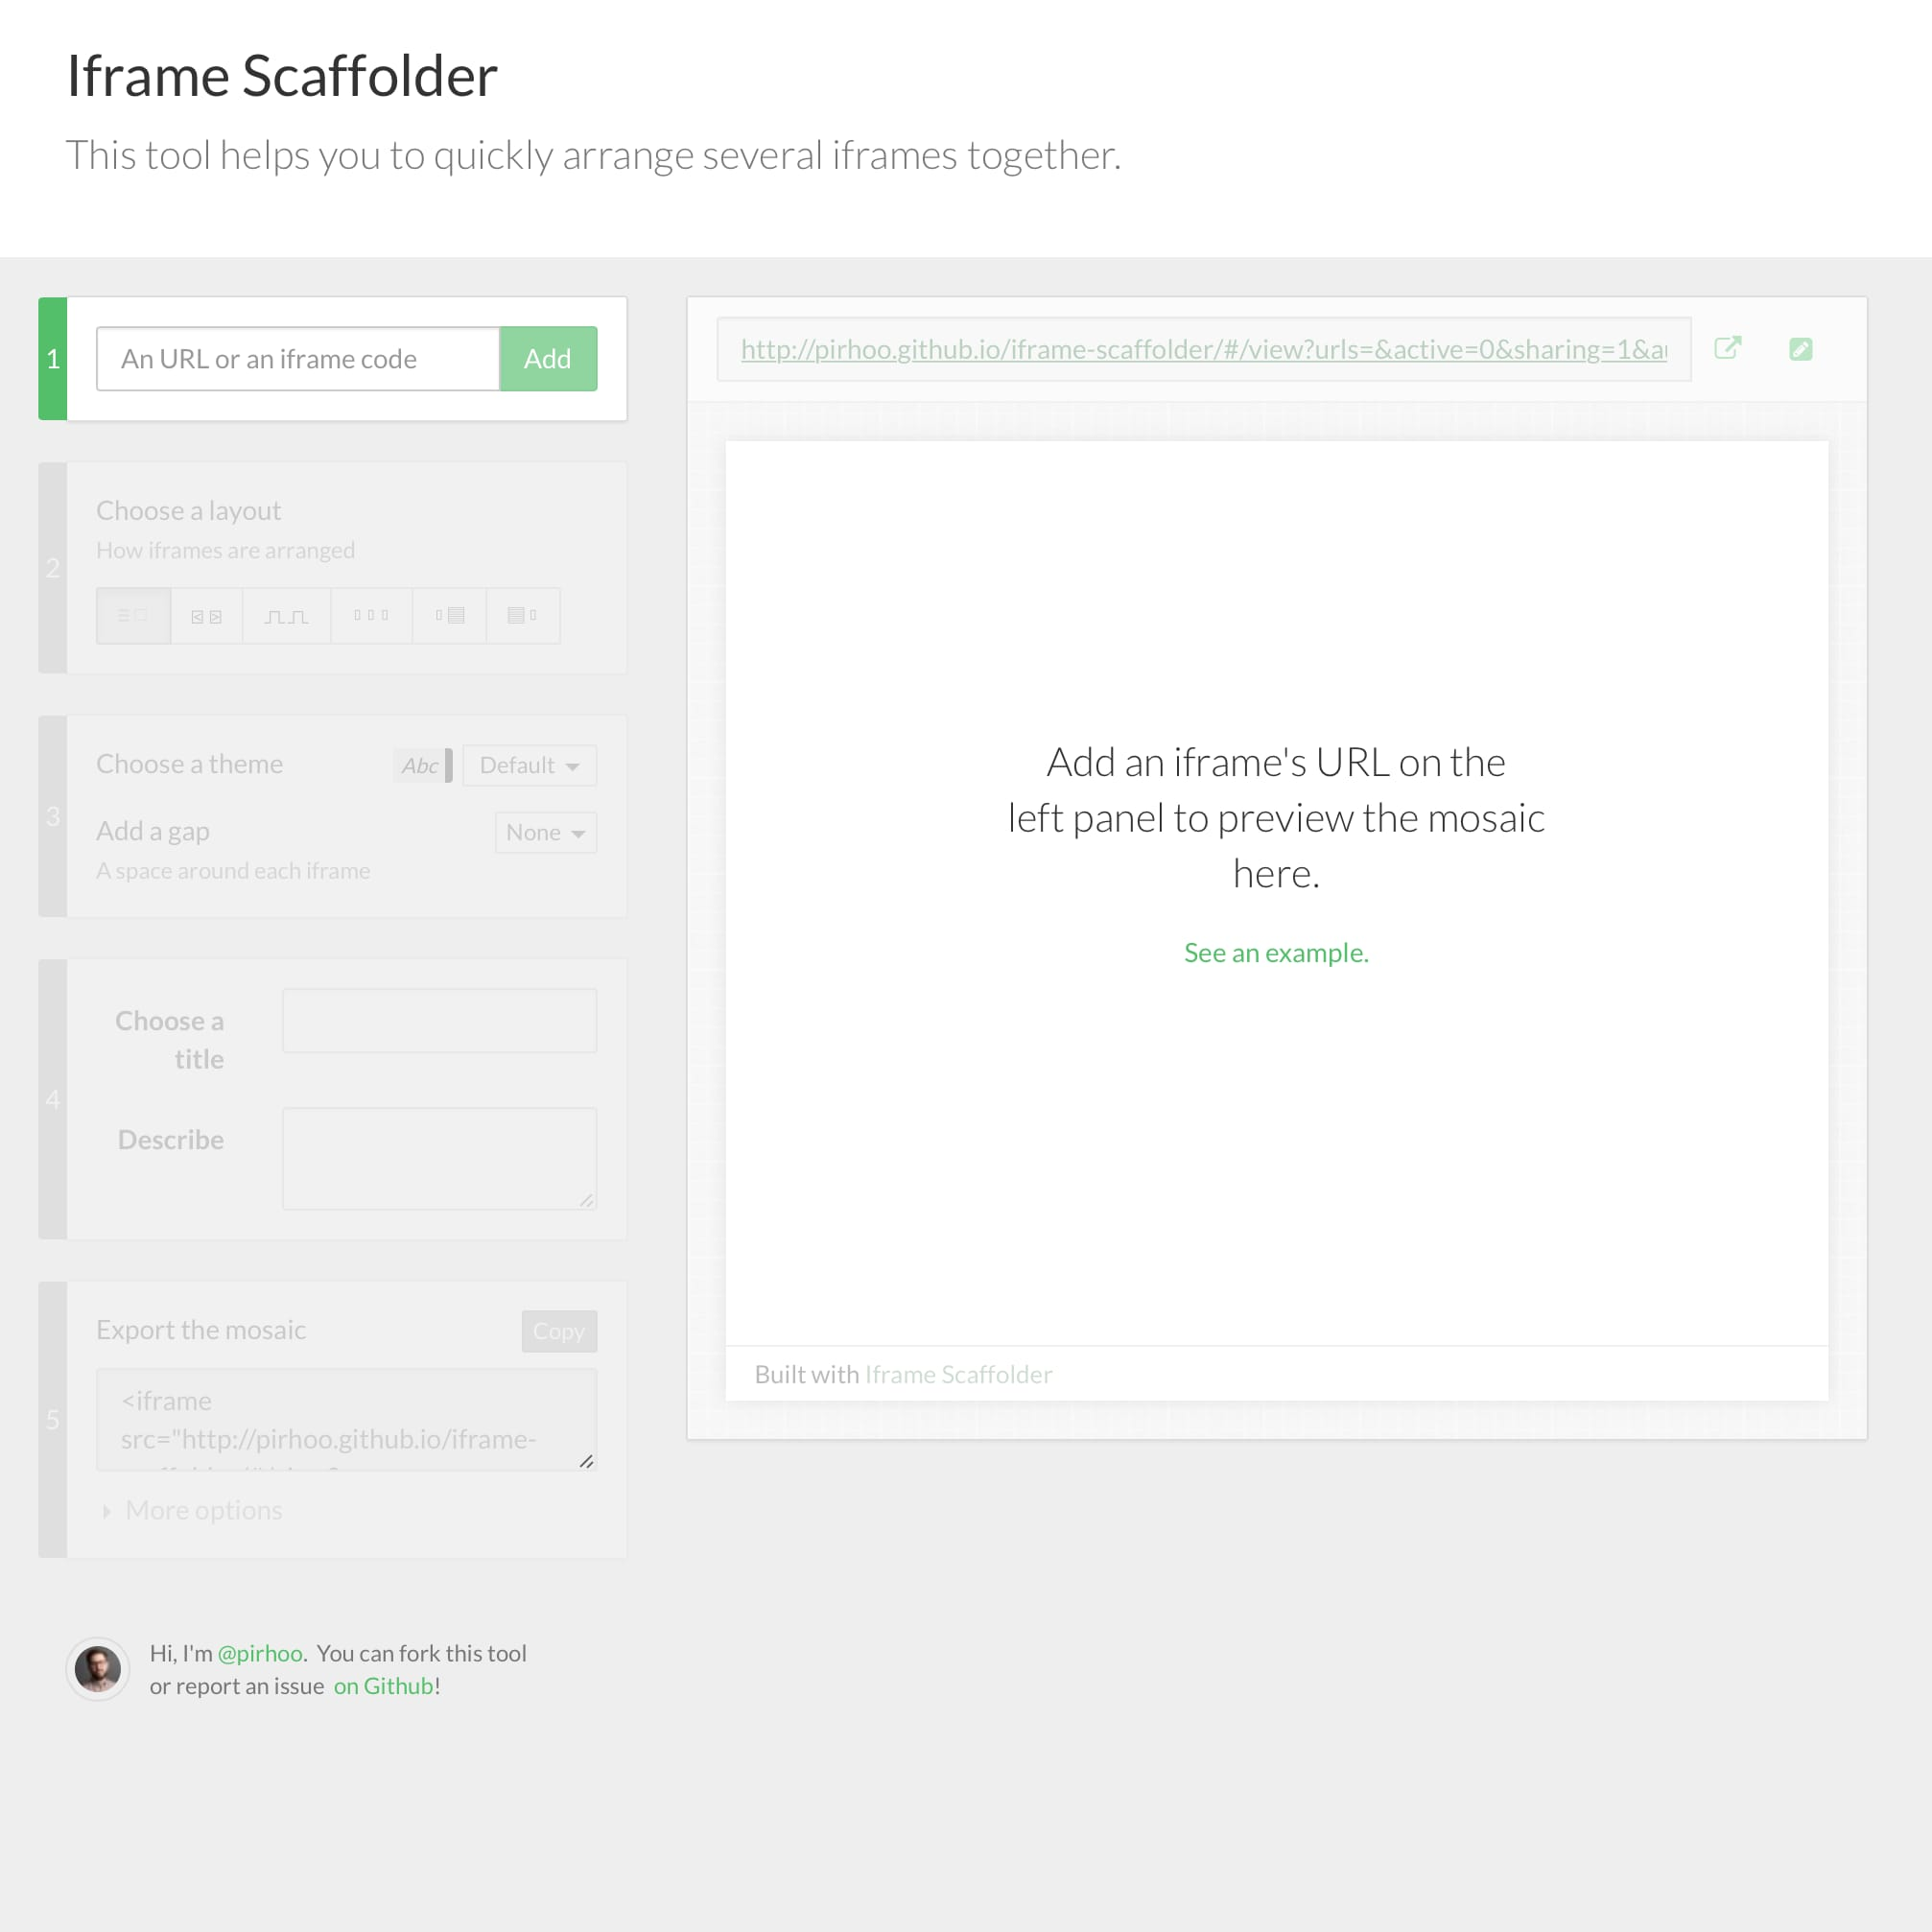 iframe Scaffolder Screenshot